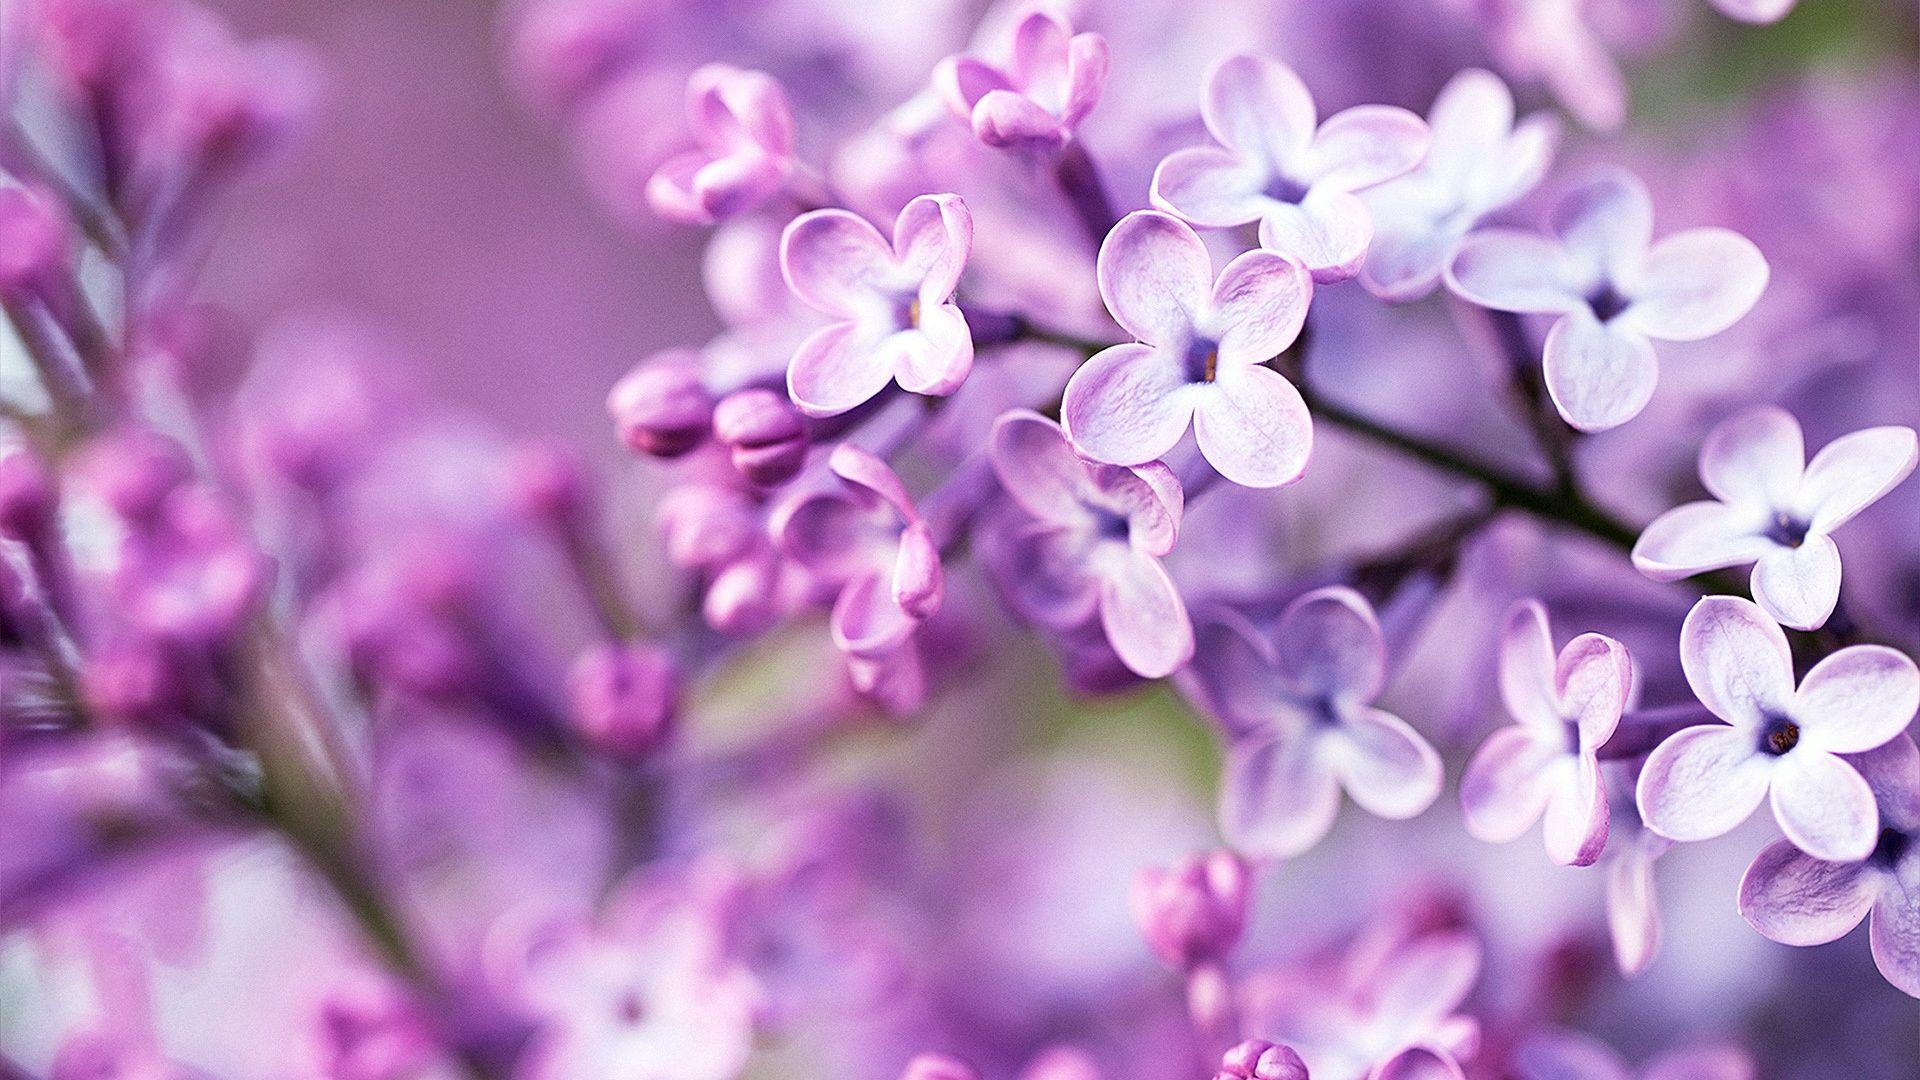 Funny Purple Flowers Hd Wallpaper: Spring Purple Flowers HD Wallpapers